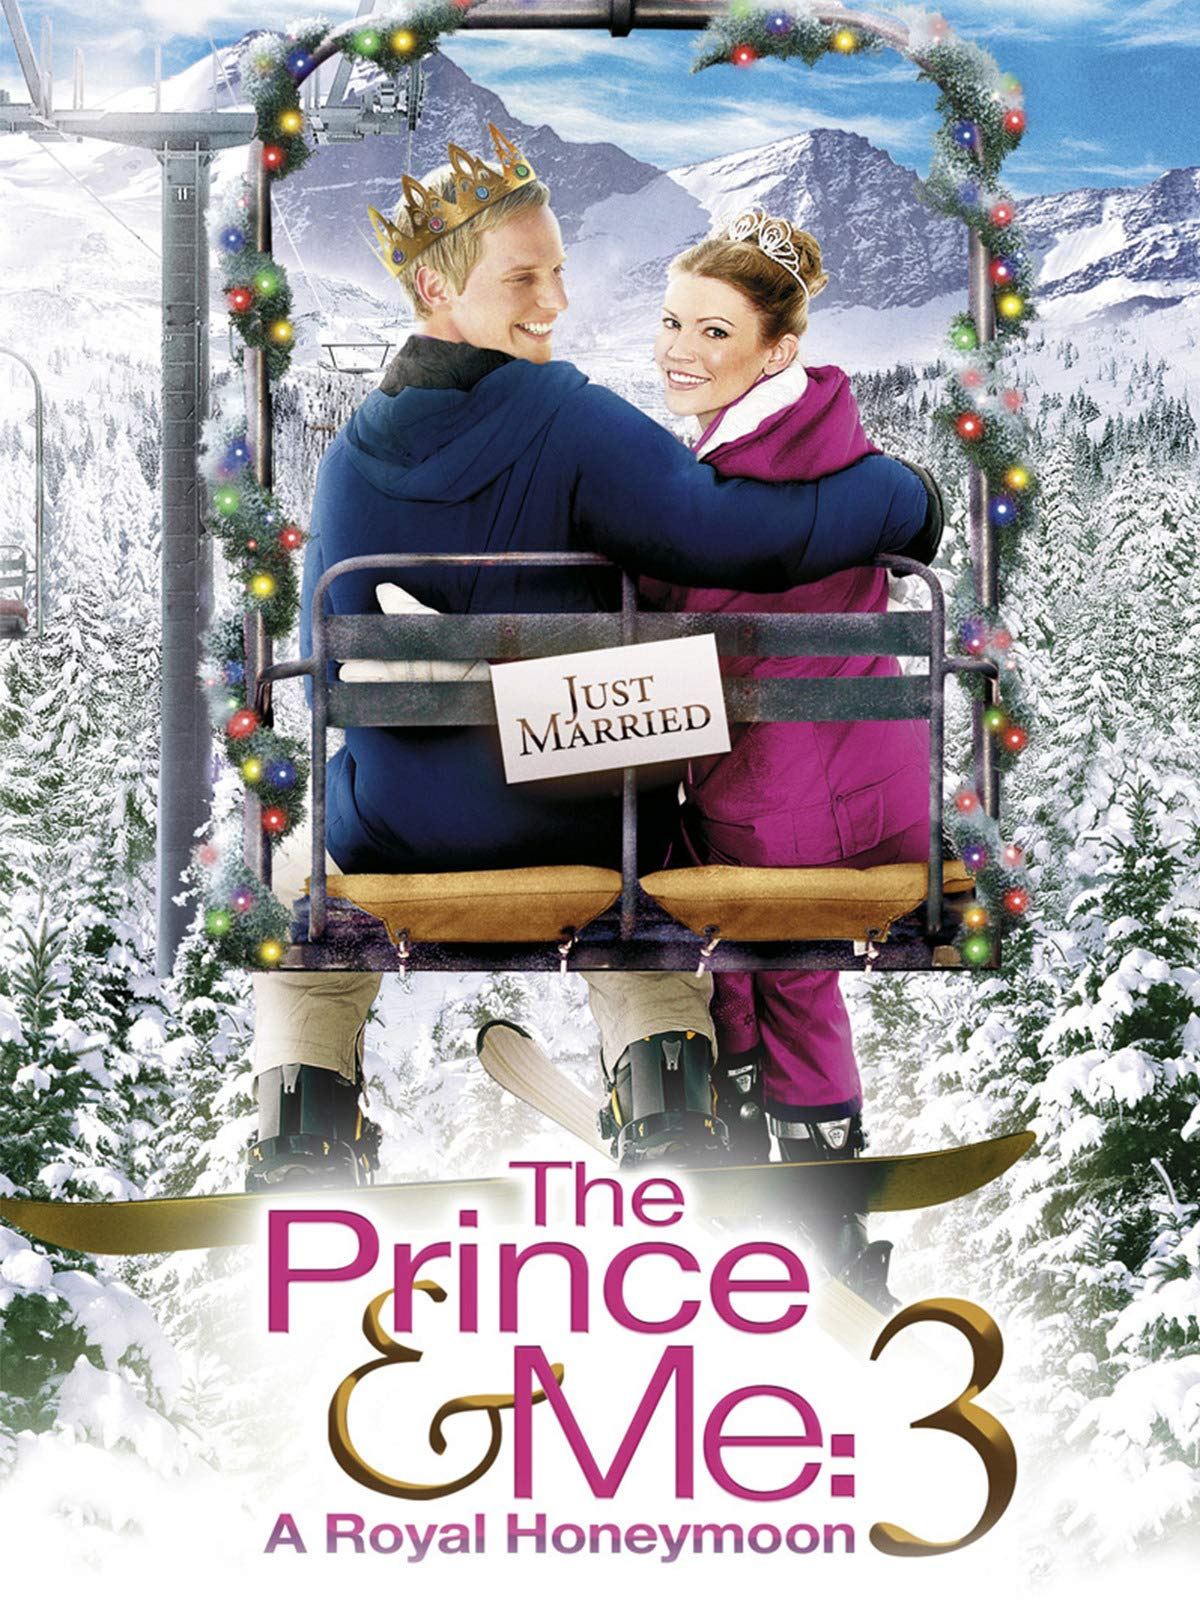 The Prince & Me 3: A Royal Honeymoon on Amazon Prime Video UK